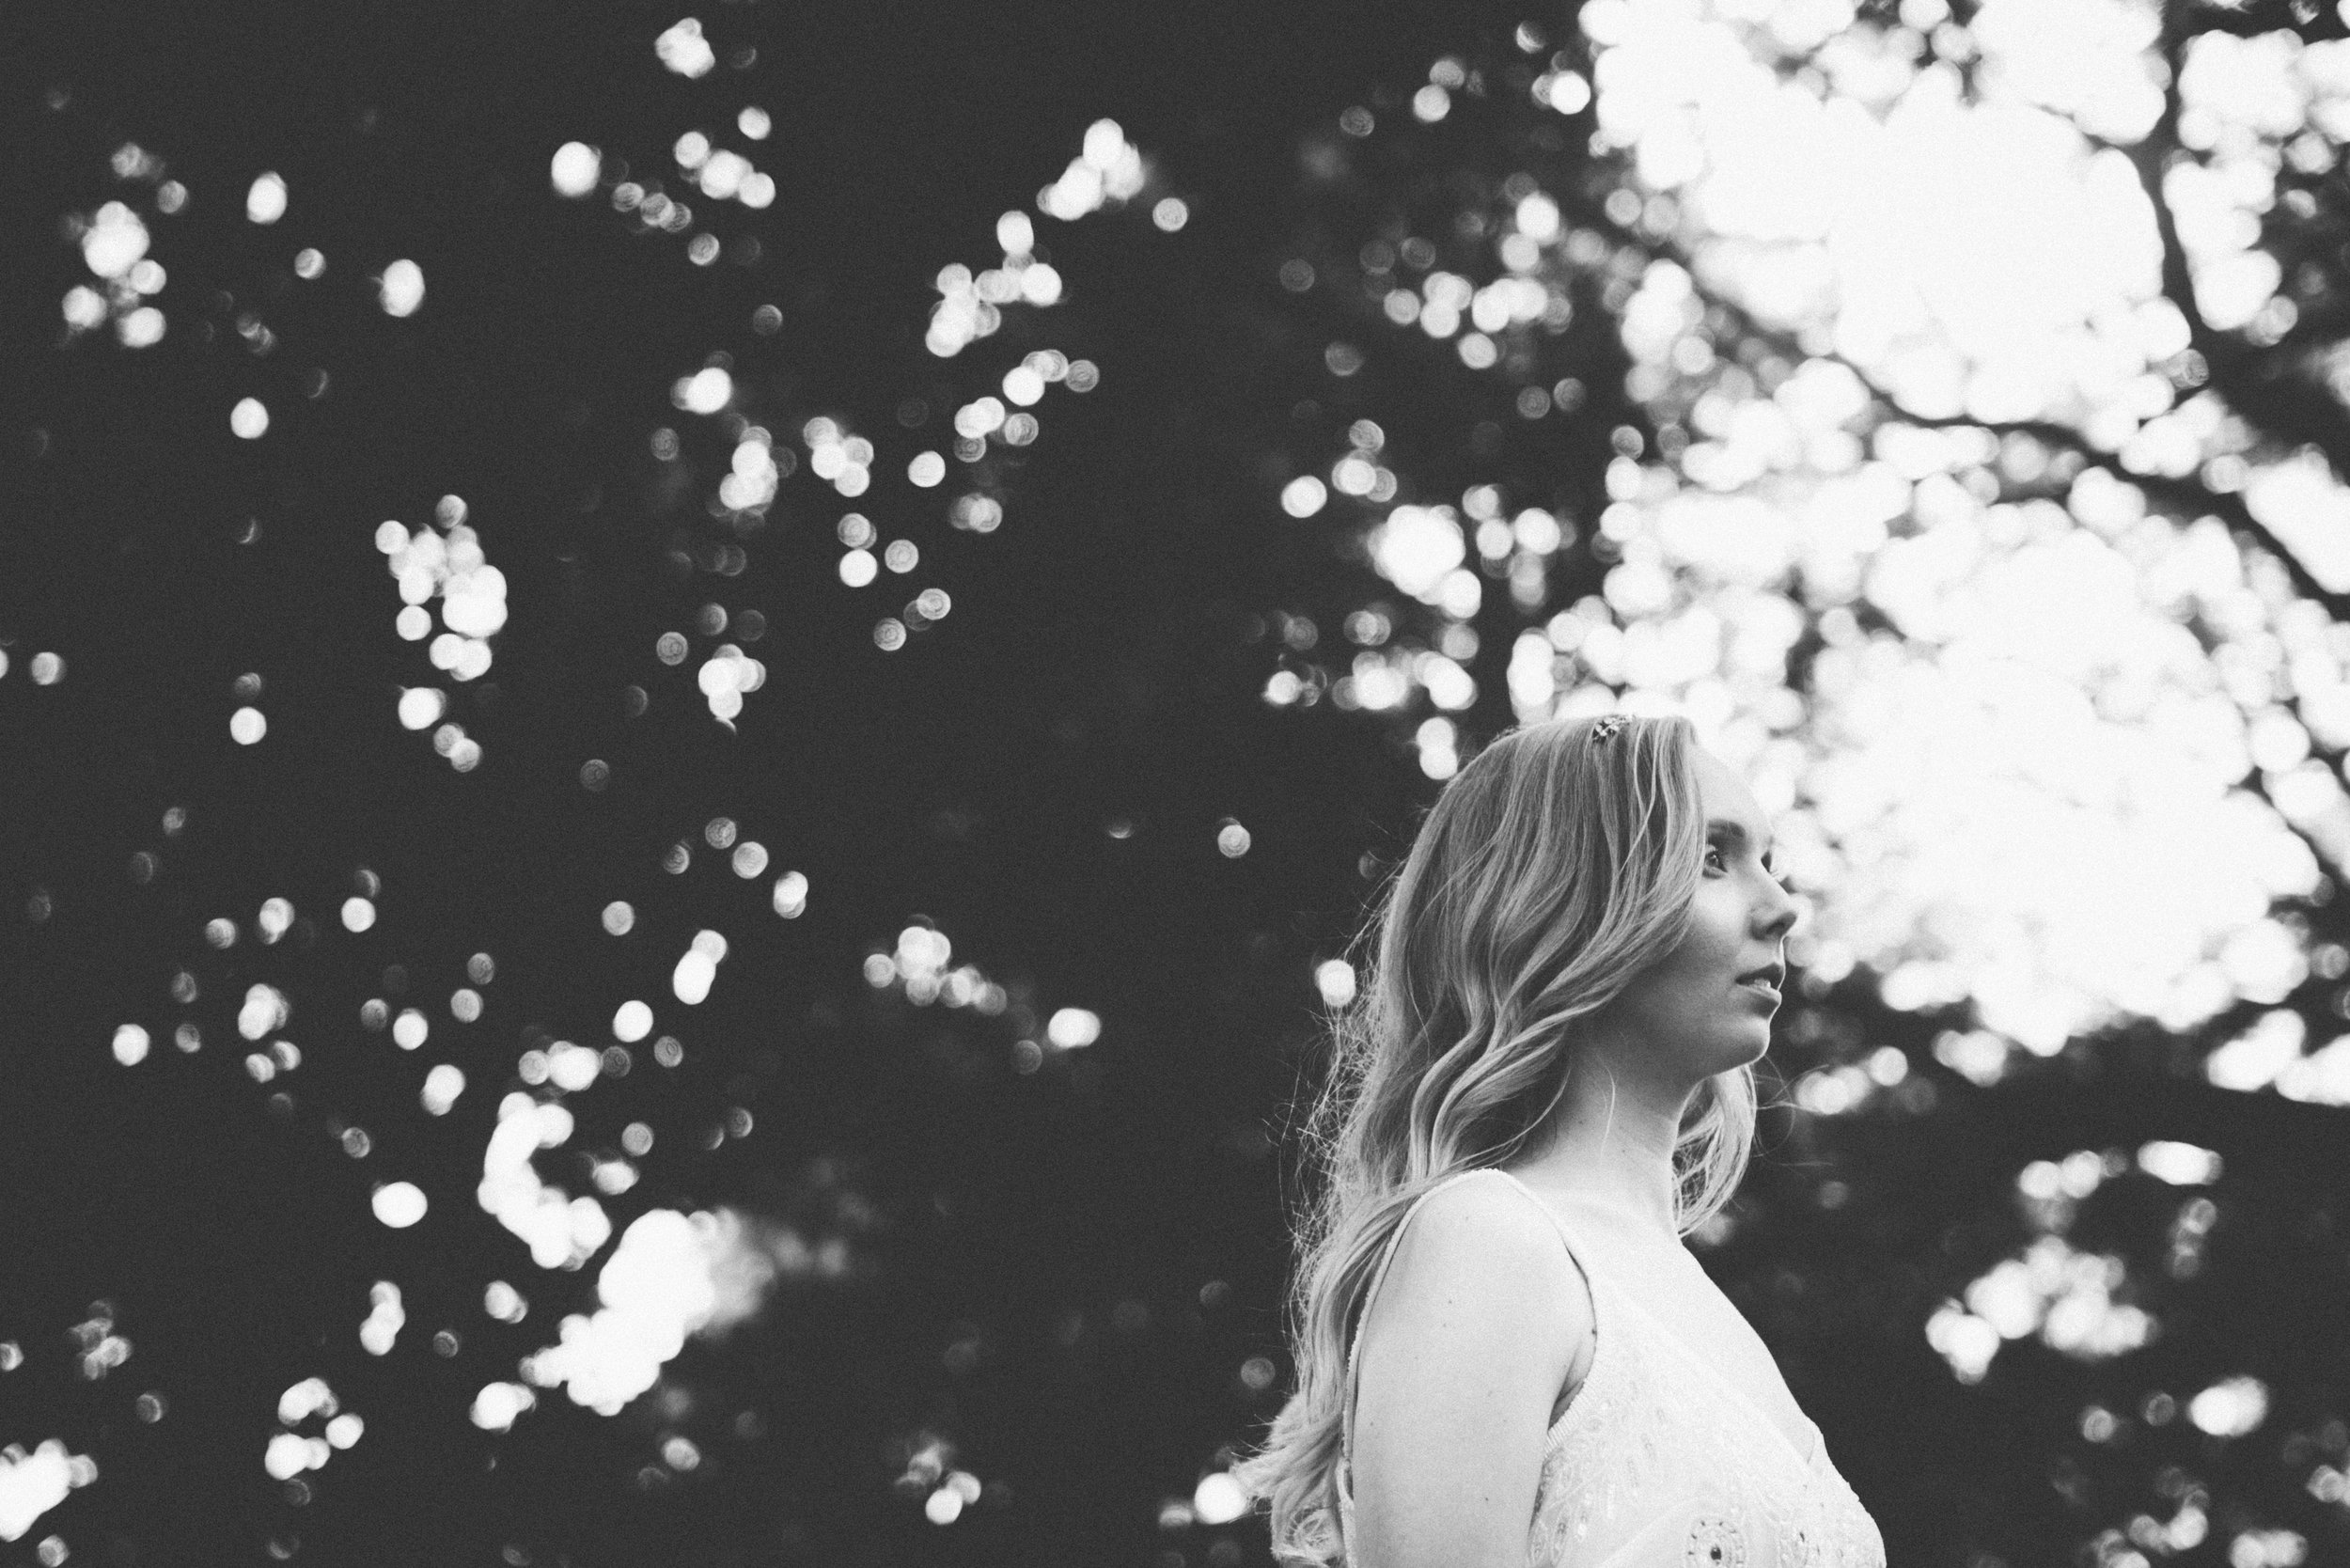 jessica-david-ledwidge-film-photos-chicago-wedding-michigan-award-winning-videographer-cinematographers-cinematography-photograher-photography